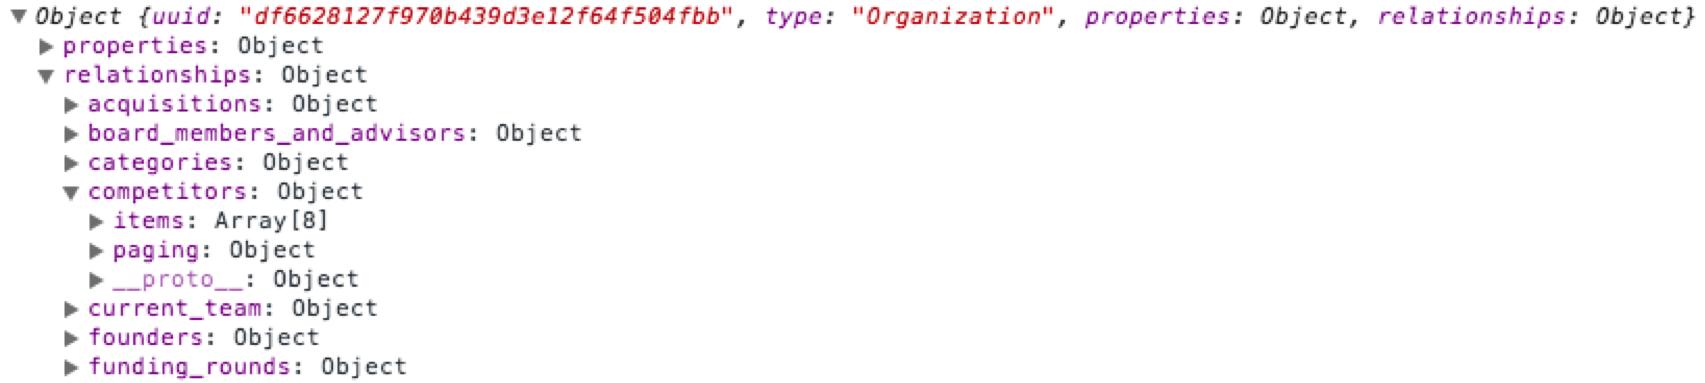 Crunch-base-API